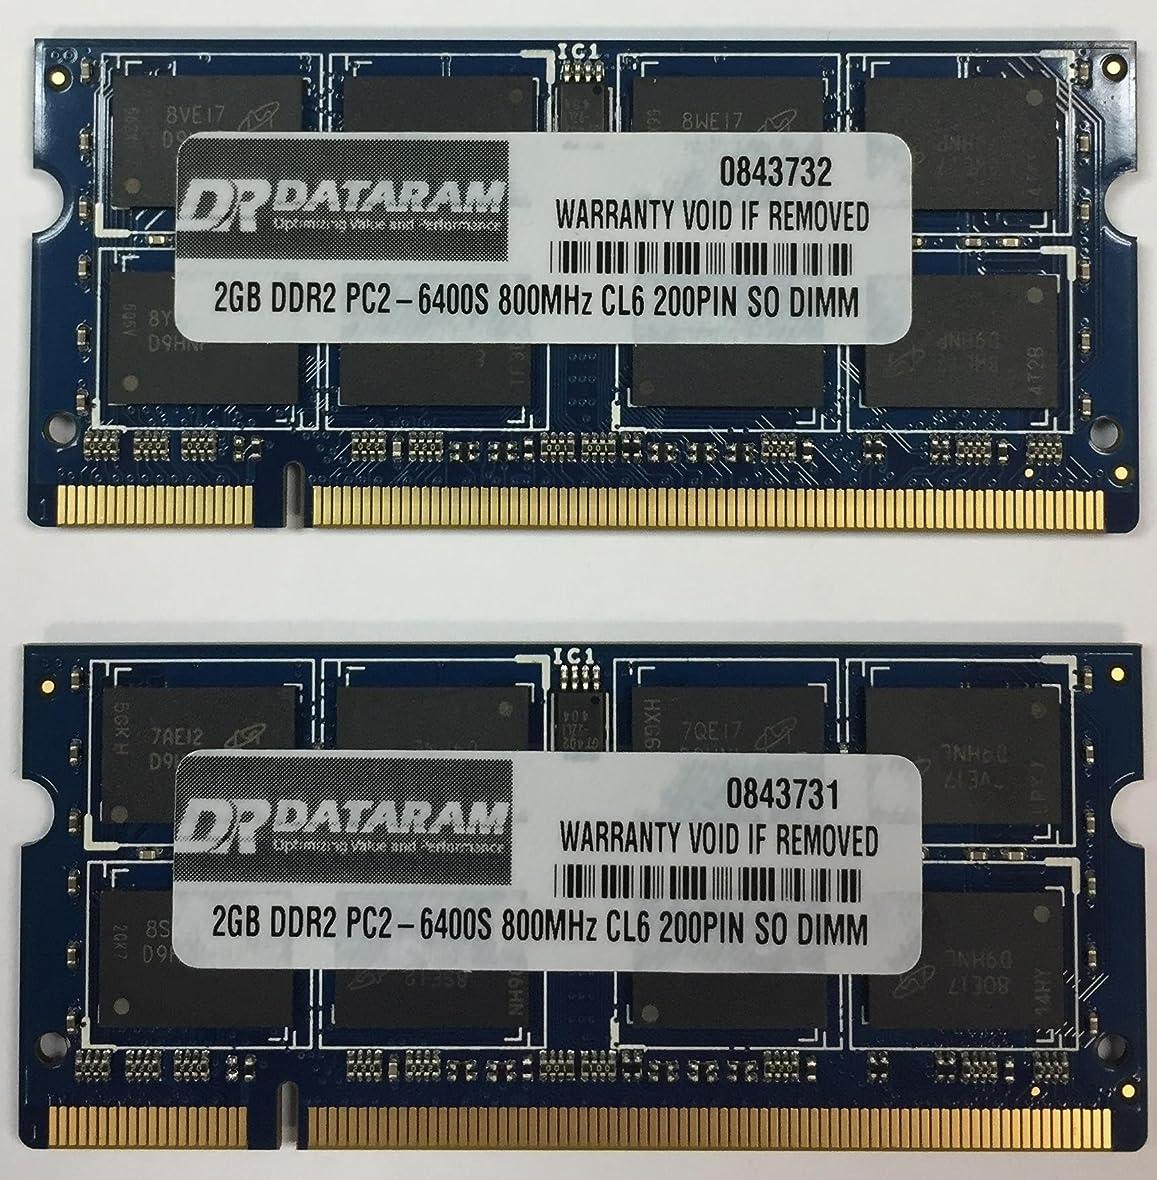 1GB DDR PC2700 333 MHz 200 pin SODIMM for Toshiba Tecra A2 Series Memory RAM